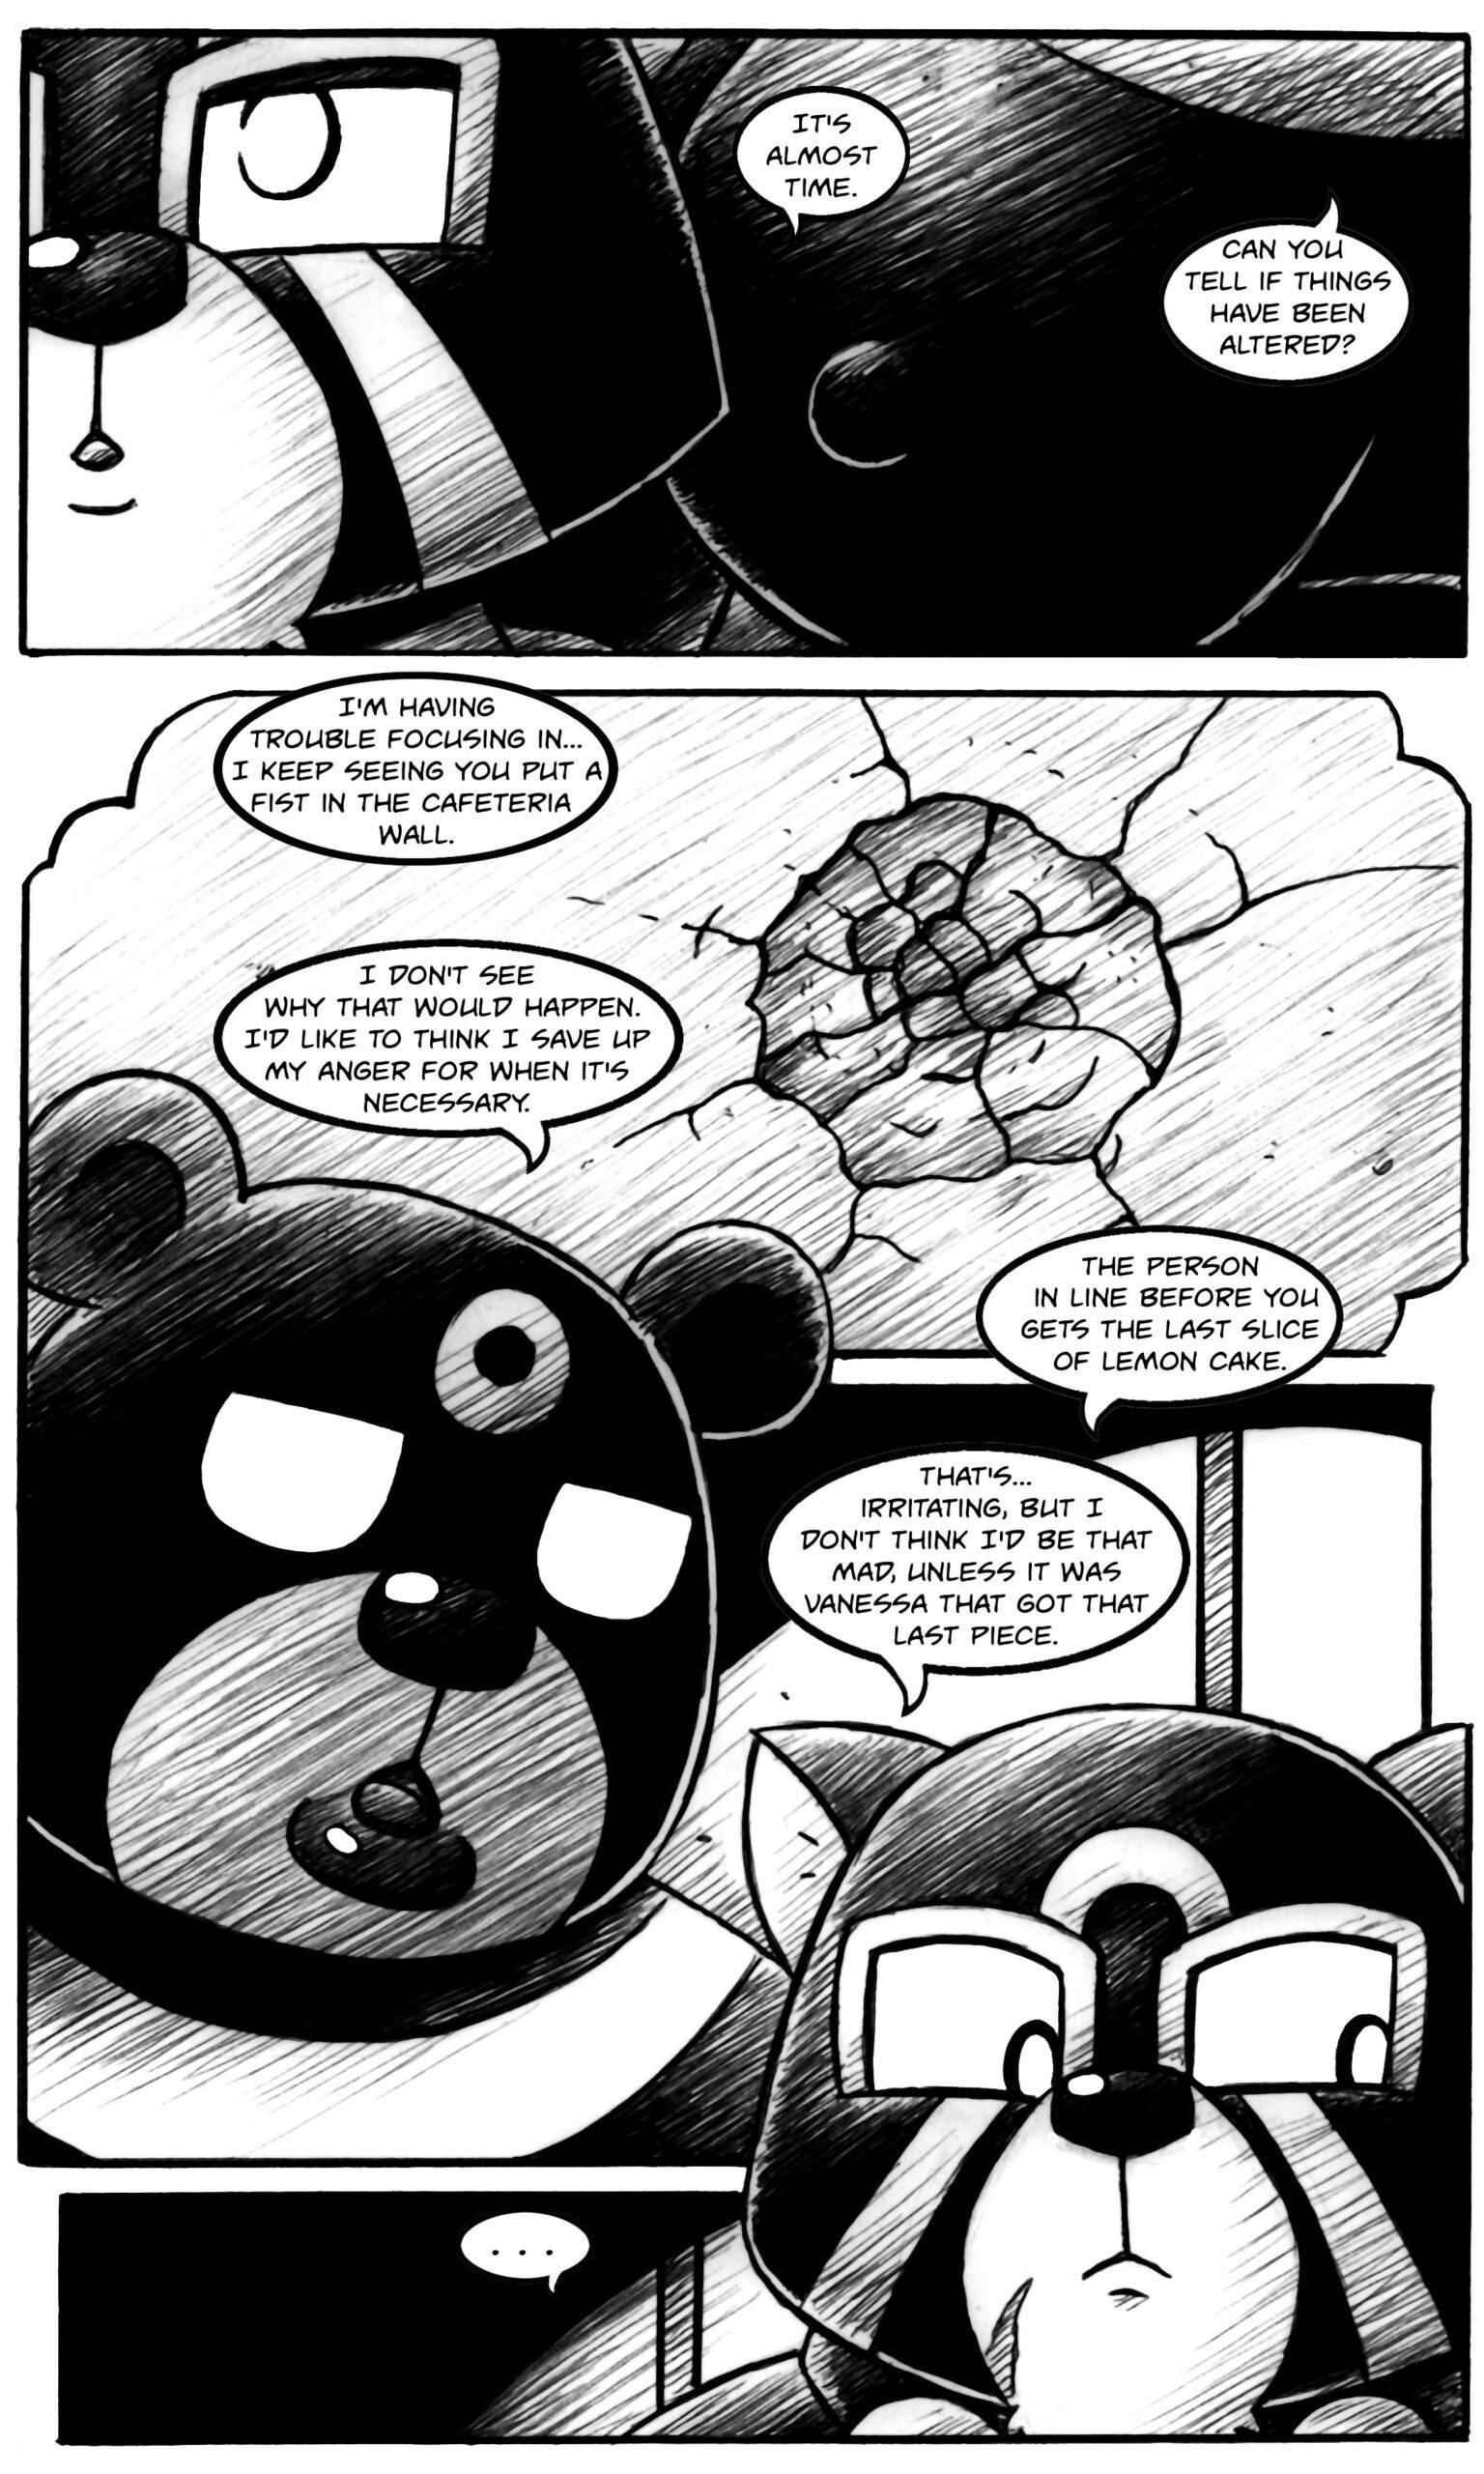 Wayfarer Rendezvous: Page 61